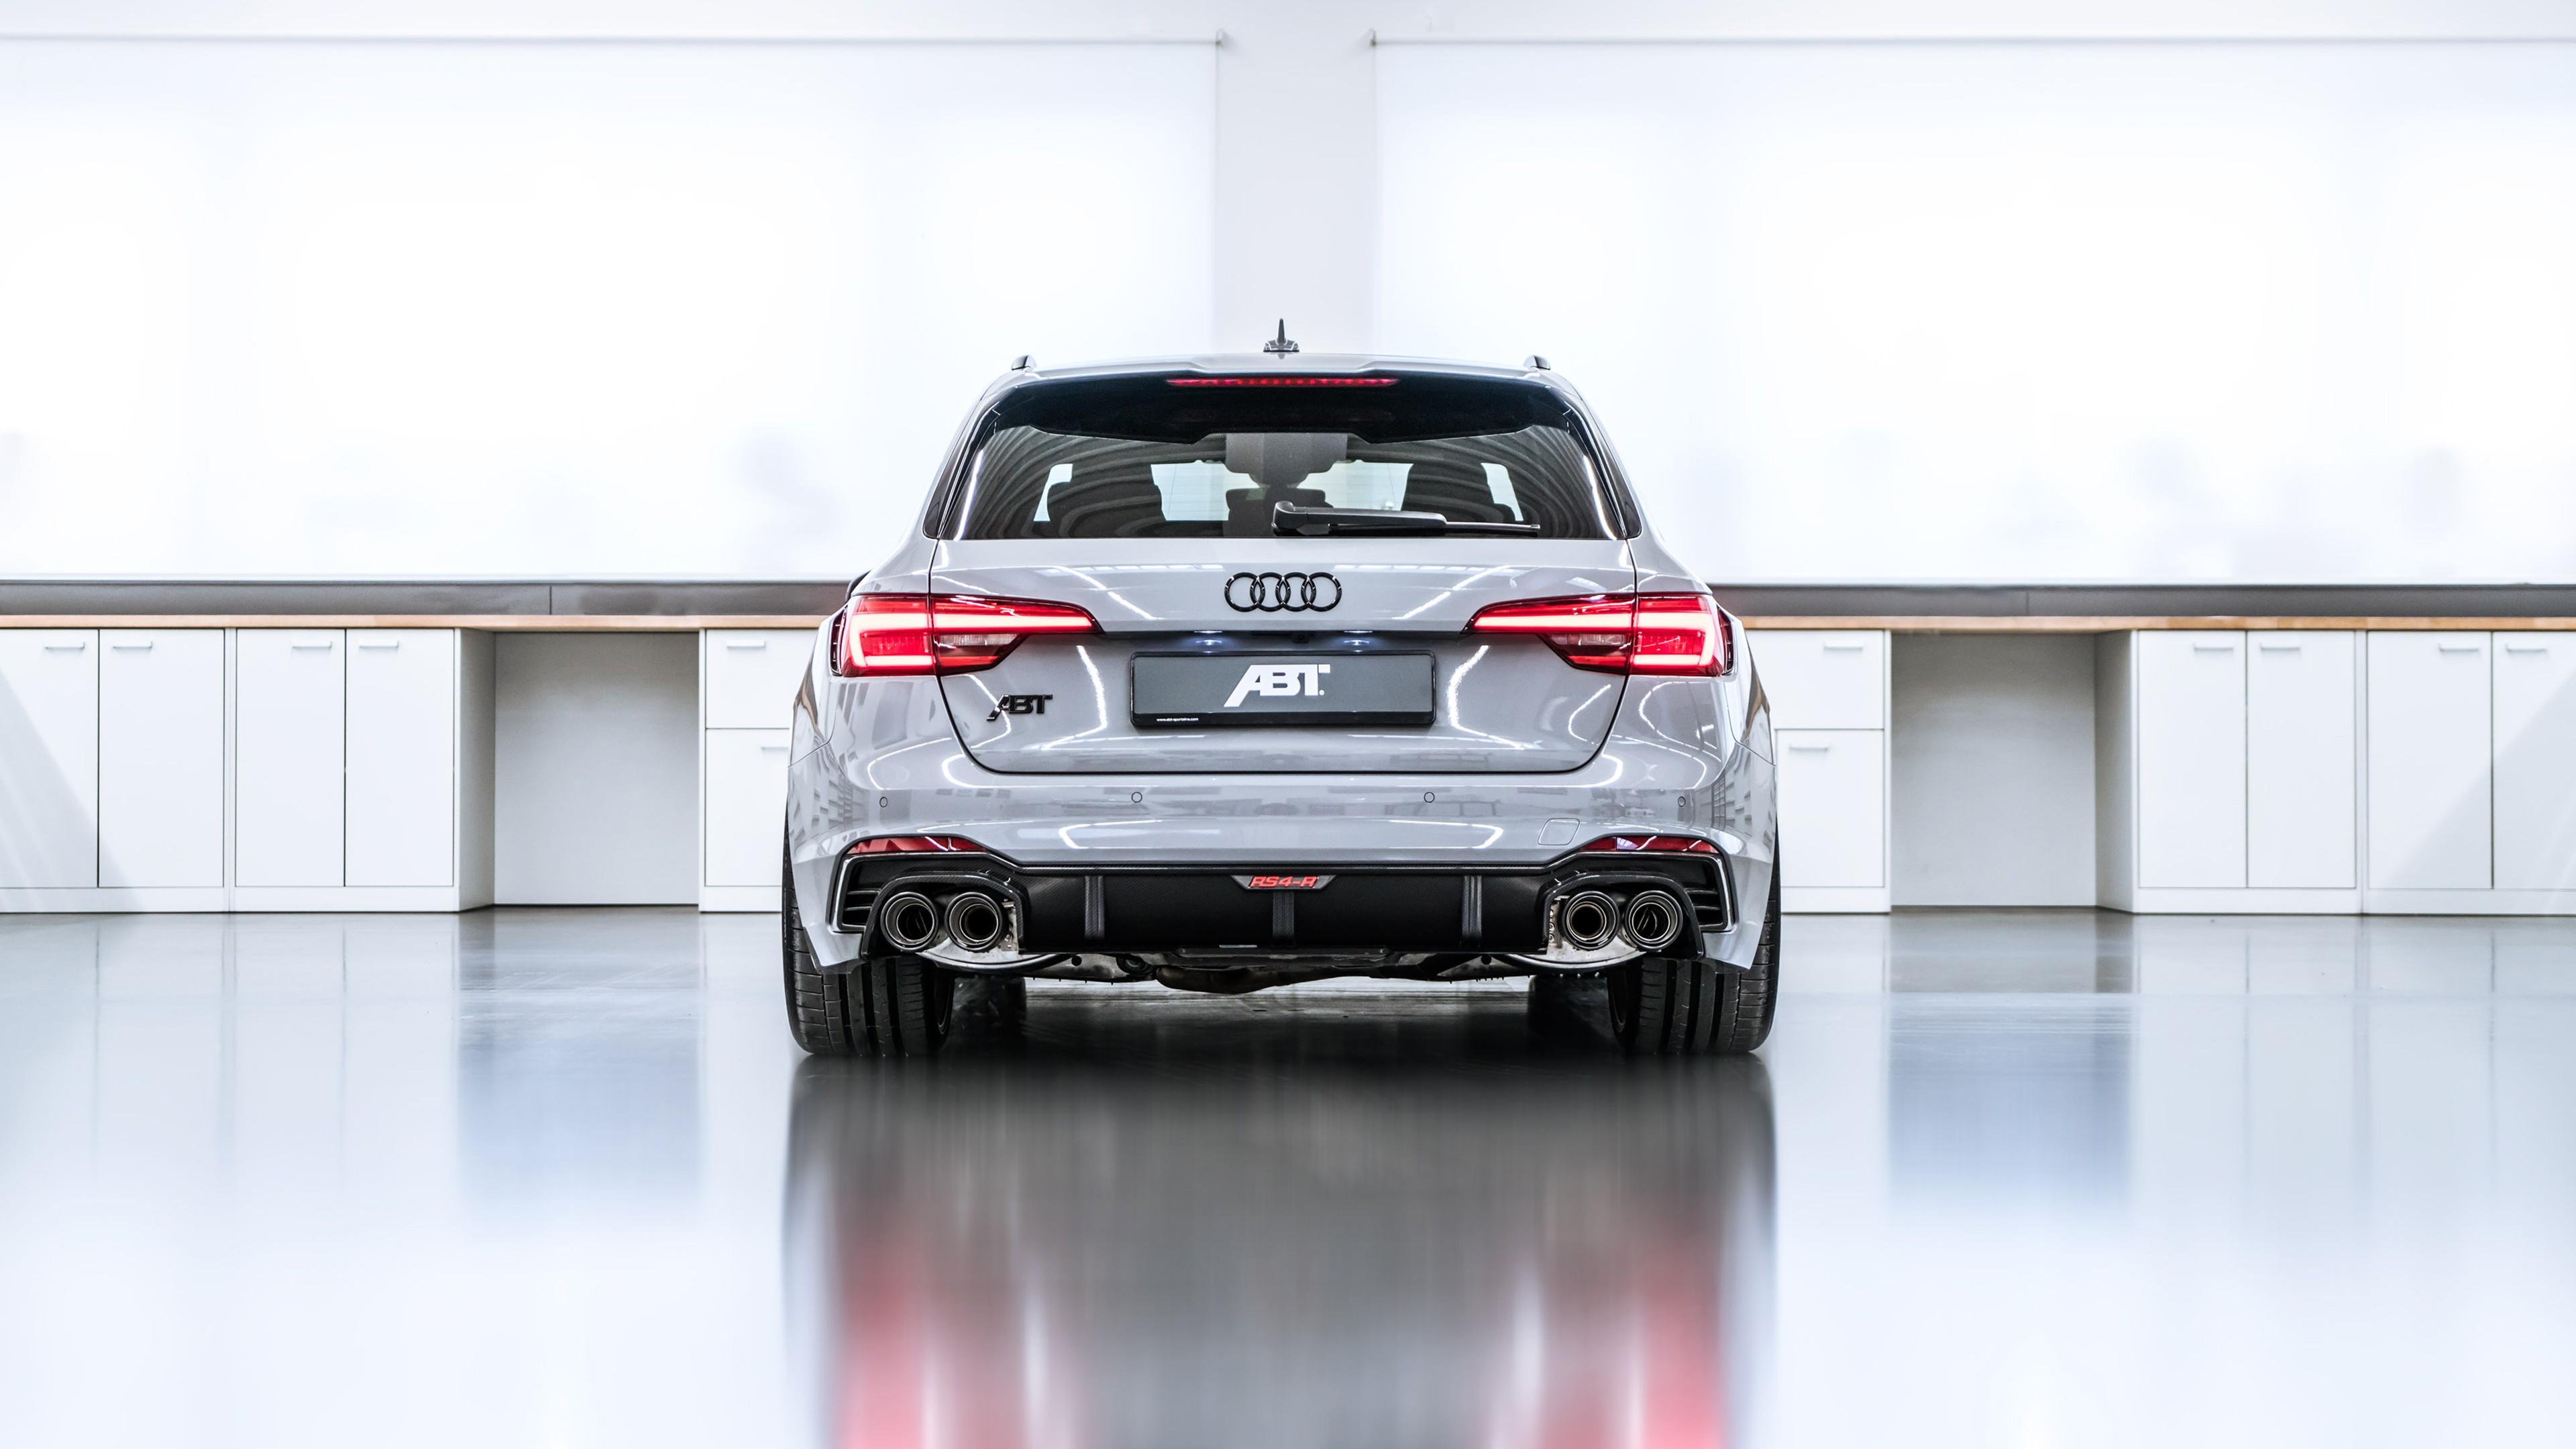 2018 Abt Audi Rs4 R Avant 4k 3 Wallpaper Hd Car Wallpapers Id 9771